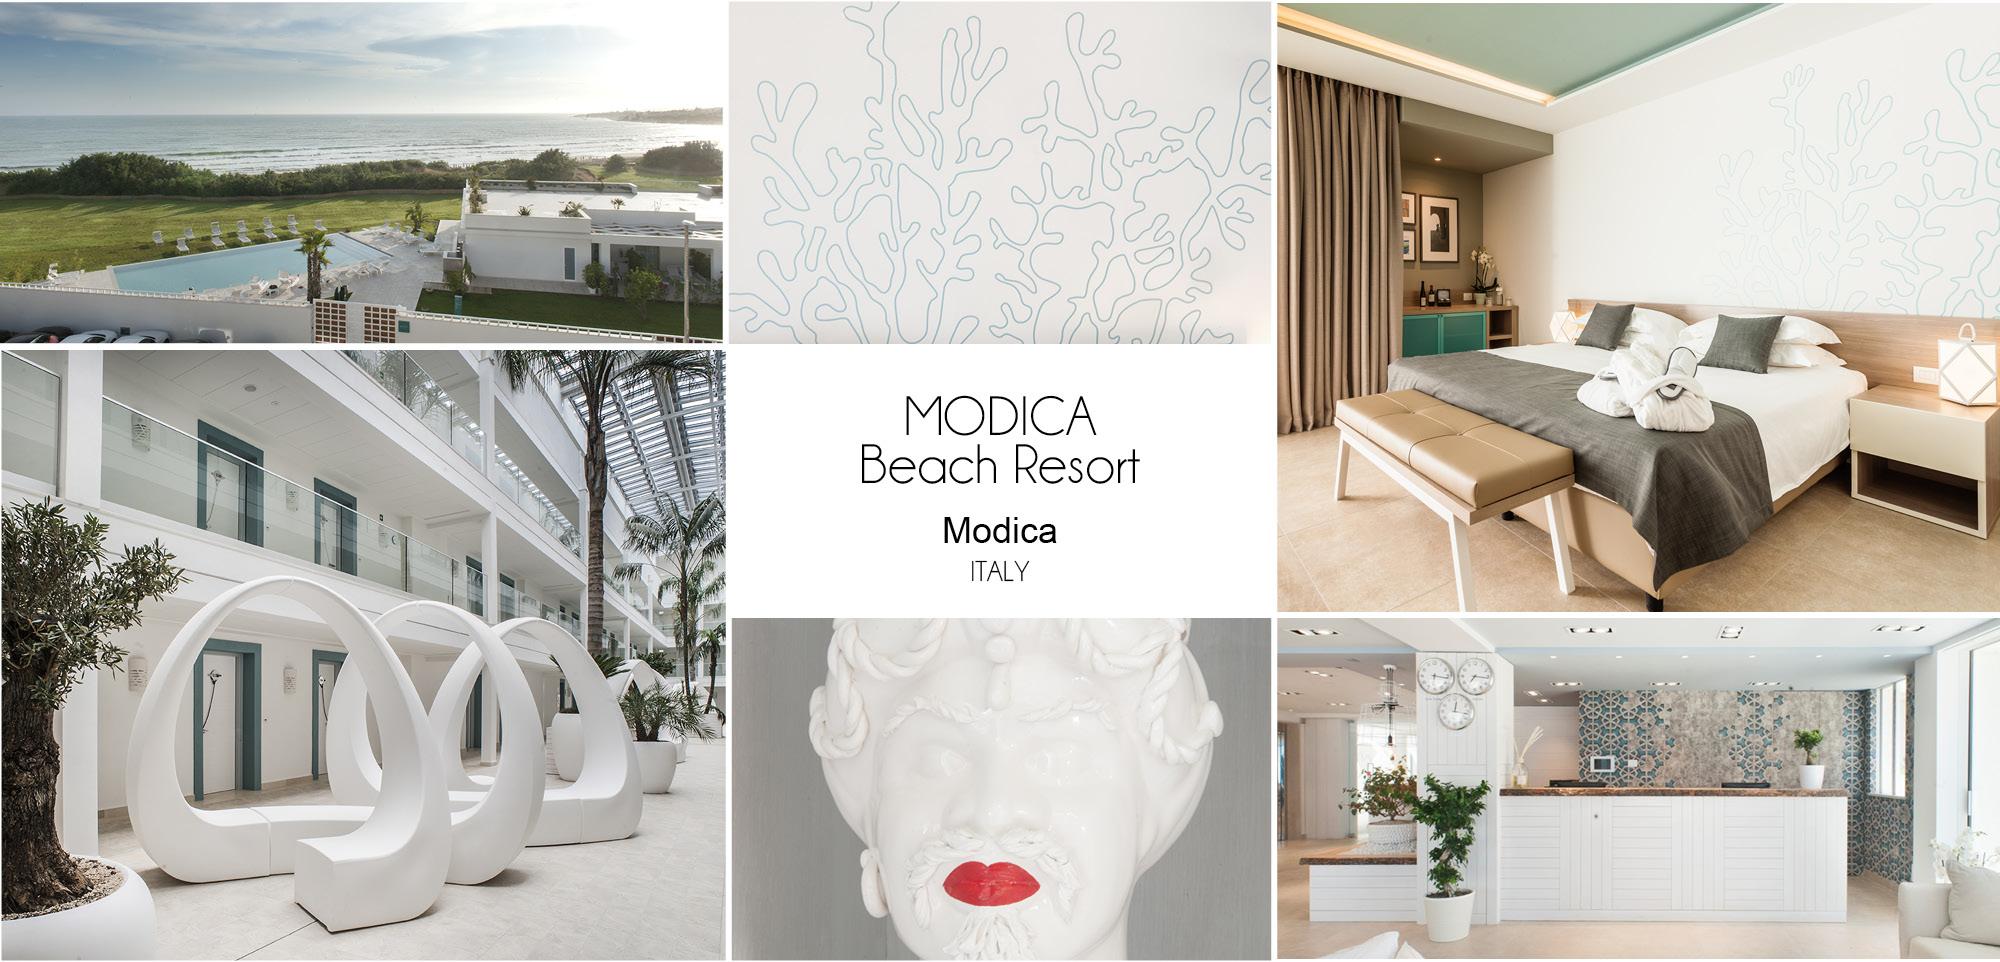 Modica _beachresort_MOOD.jpg